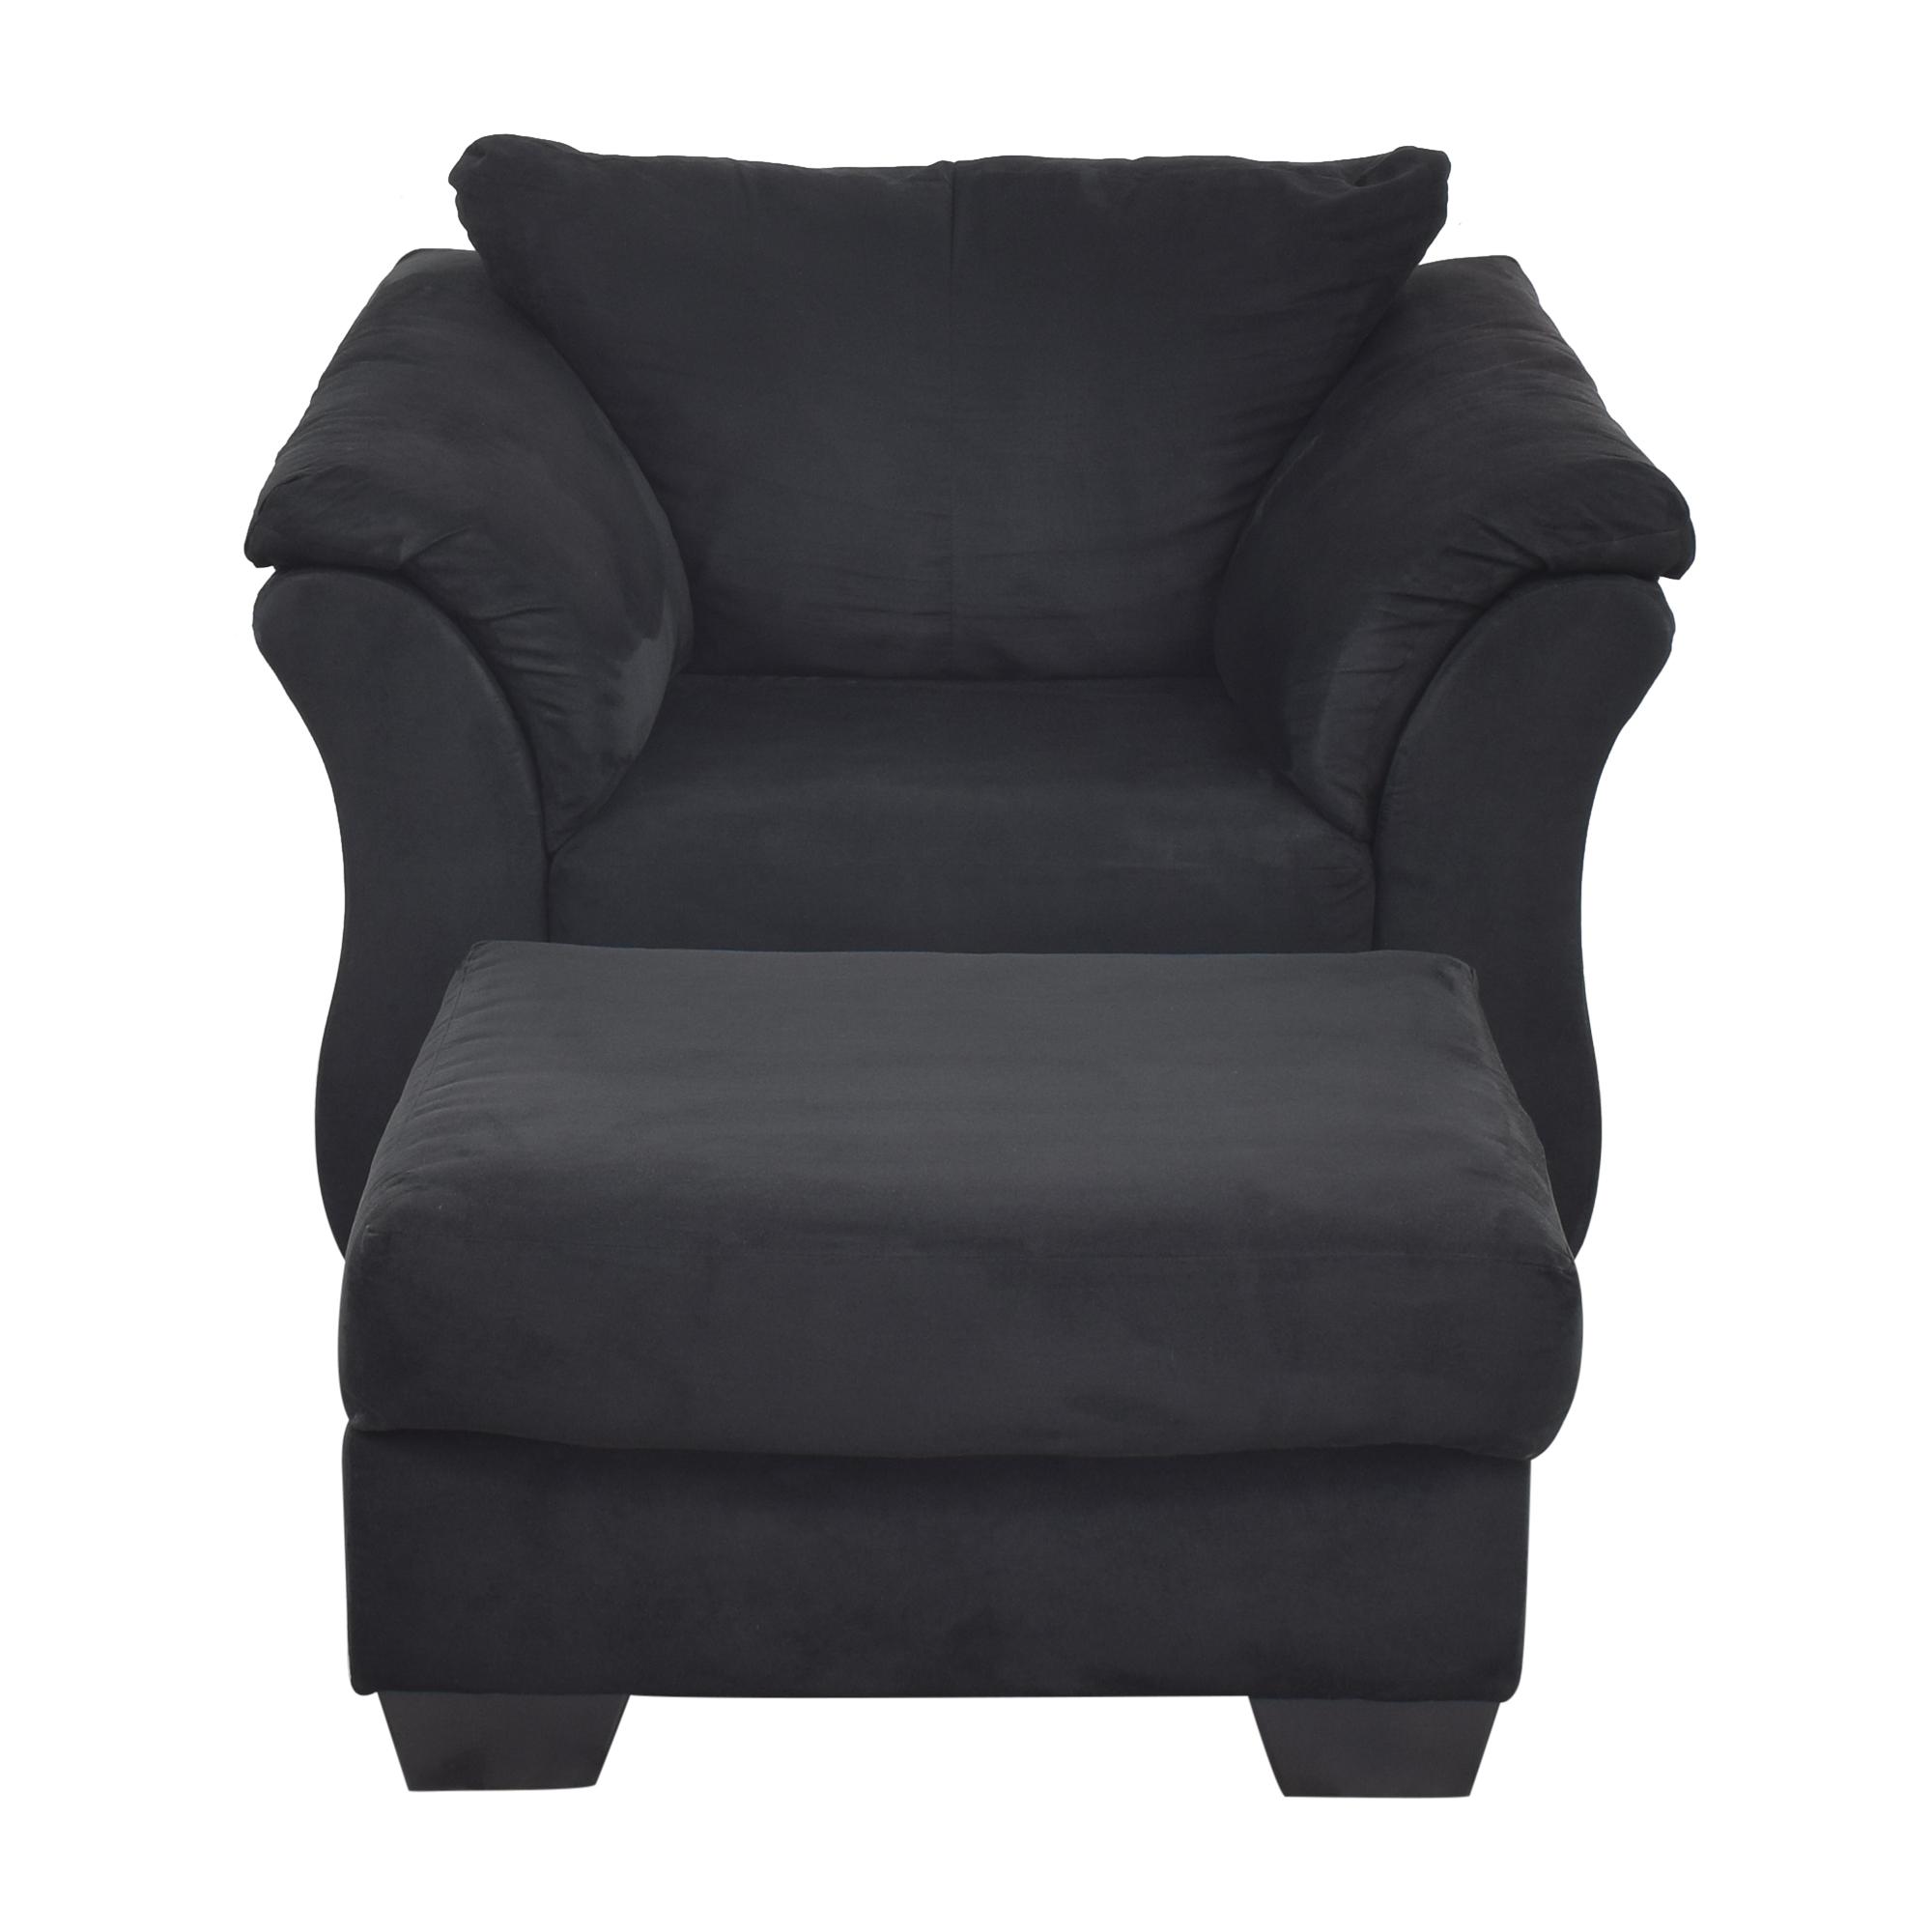 Ashley Furniture Ashley Furniture Darcy Cobblestone Chair and Ottoman nj